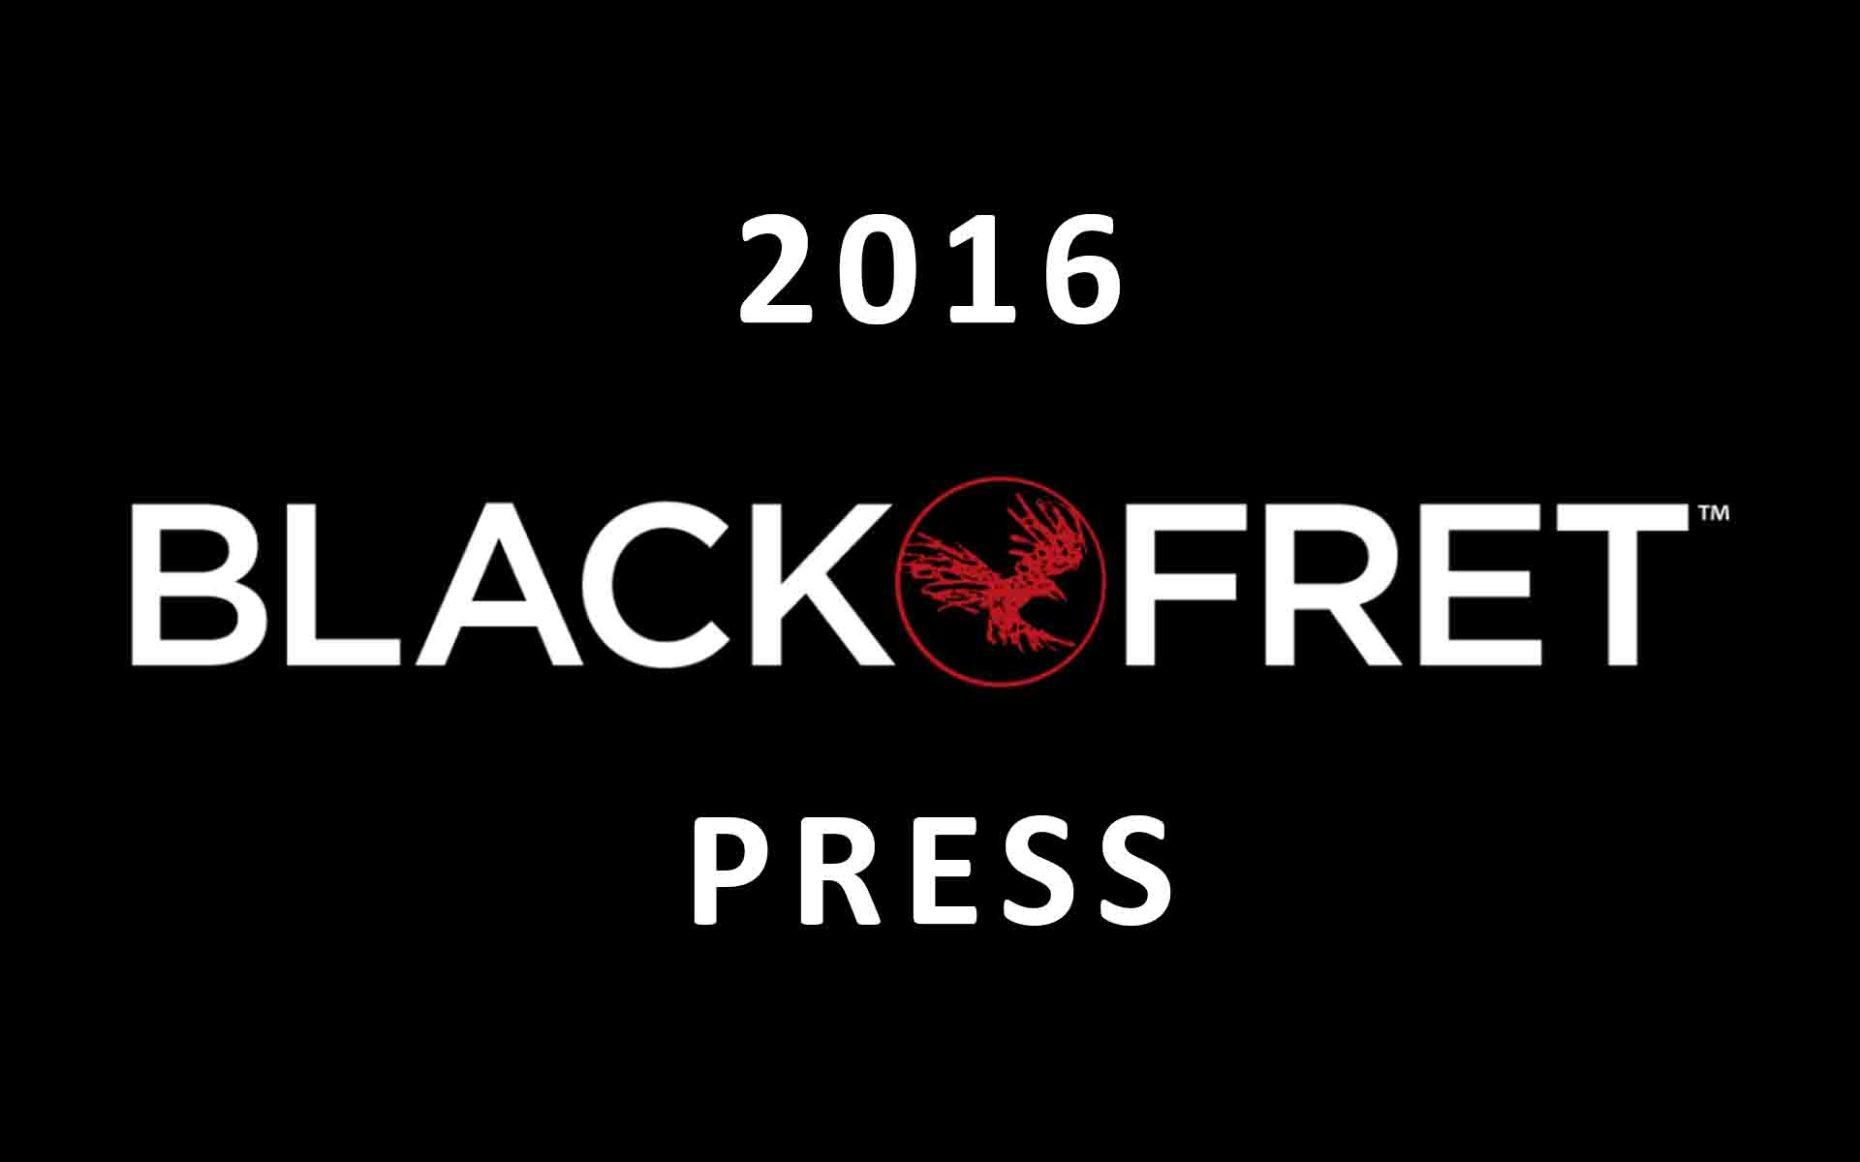 2016 PRESS